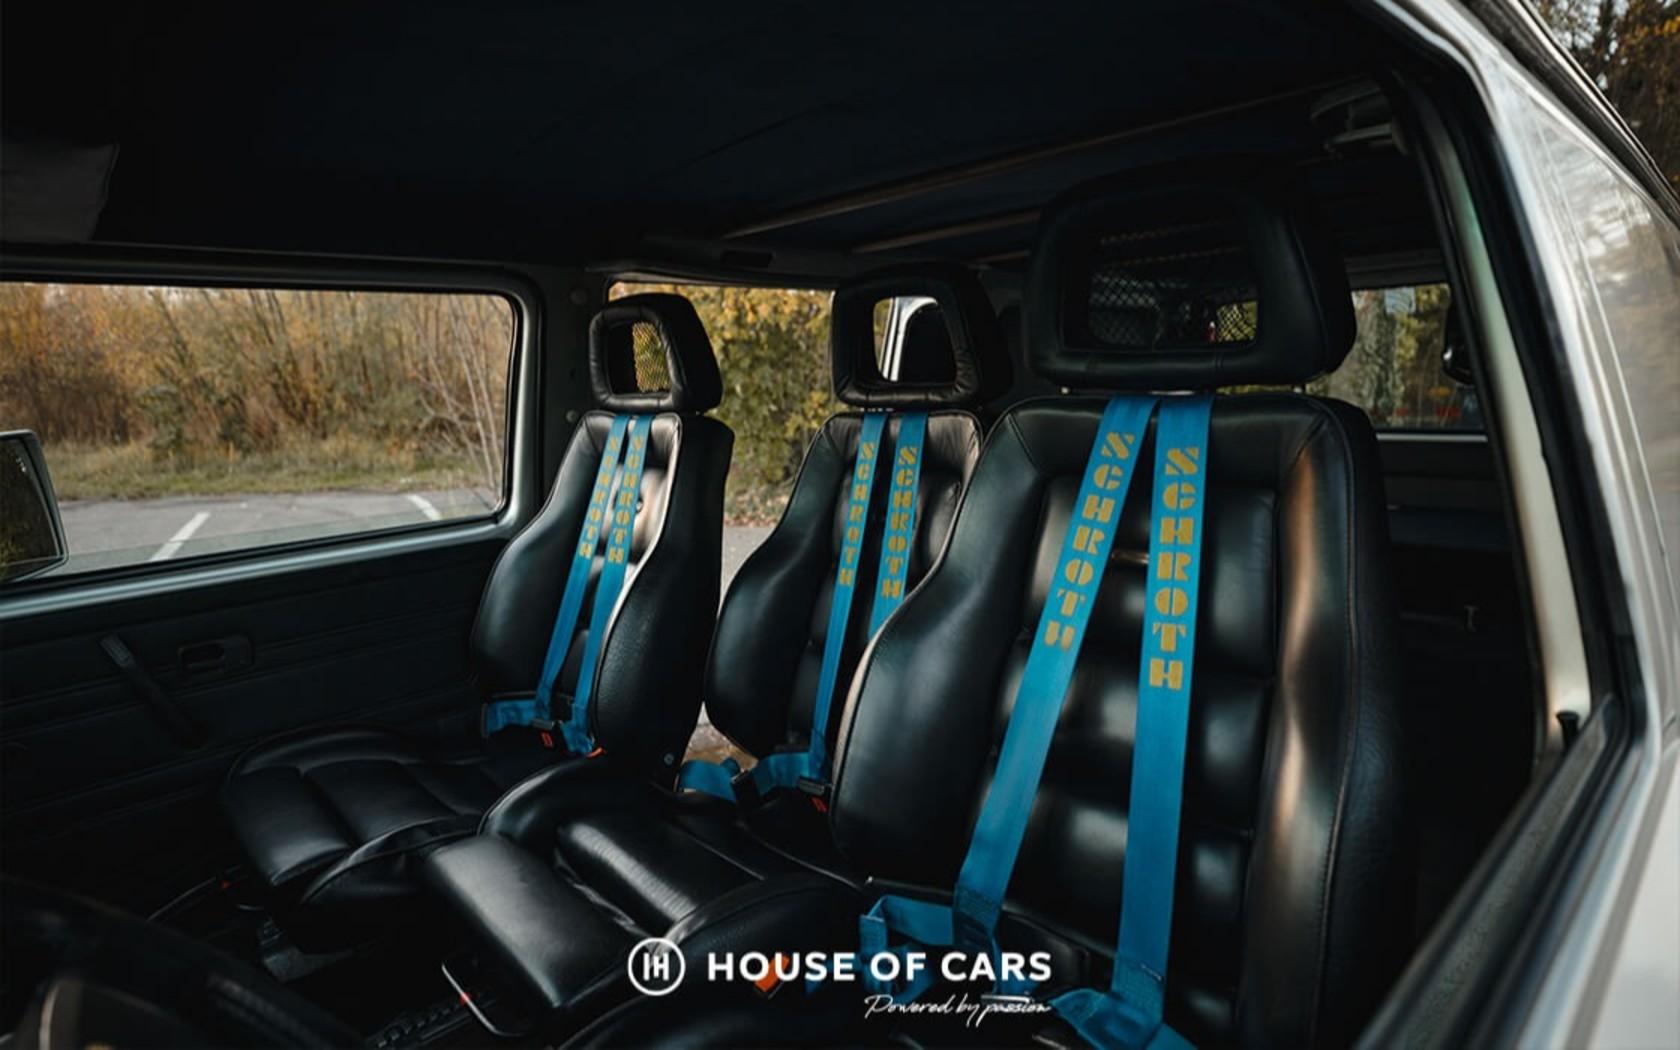 Старый Volkswagen T3 продают по цене нового Туарега